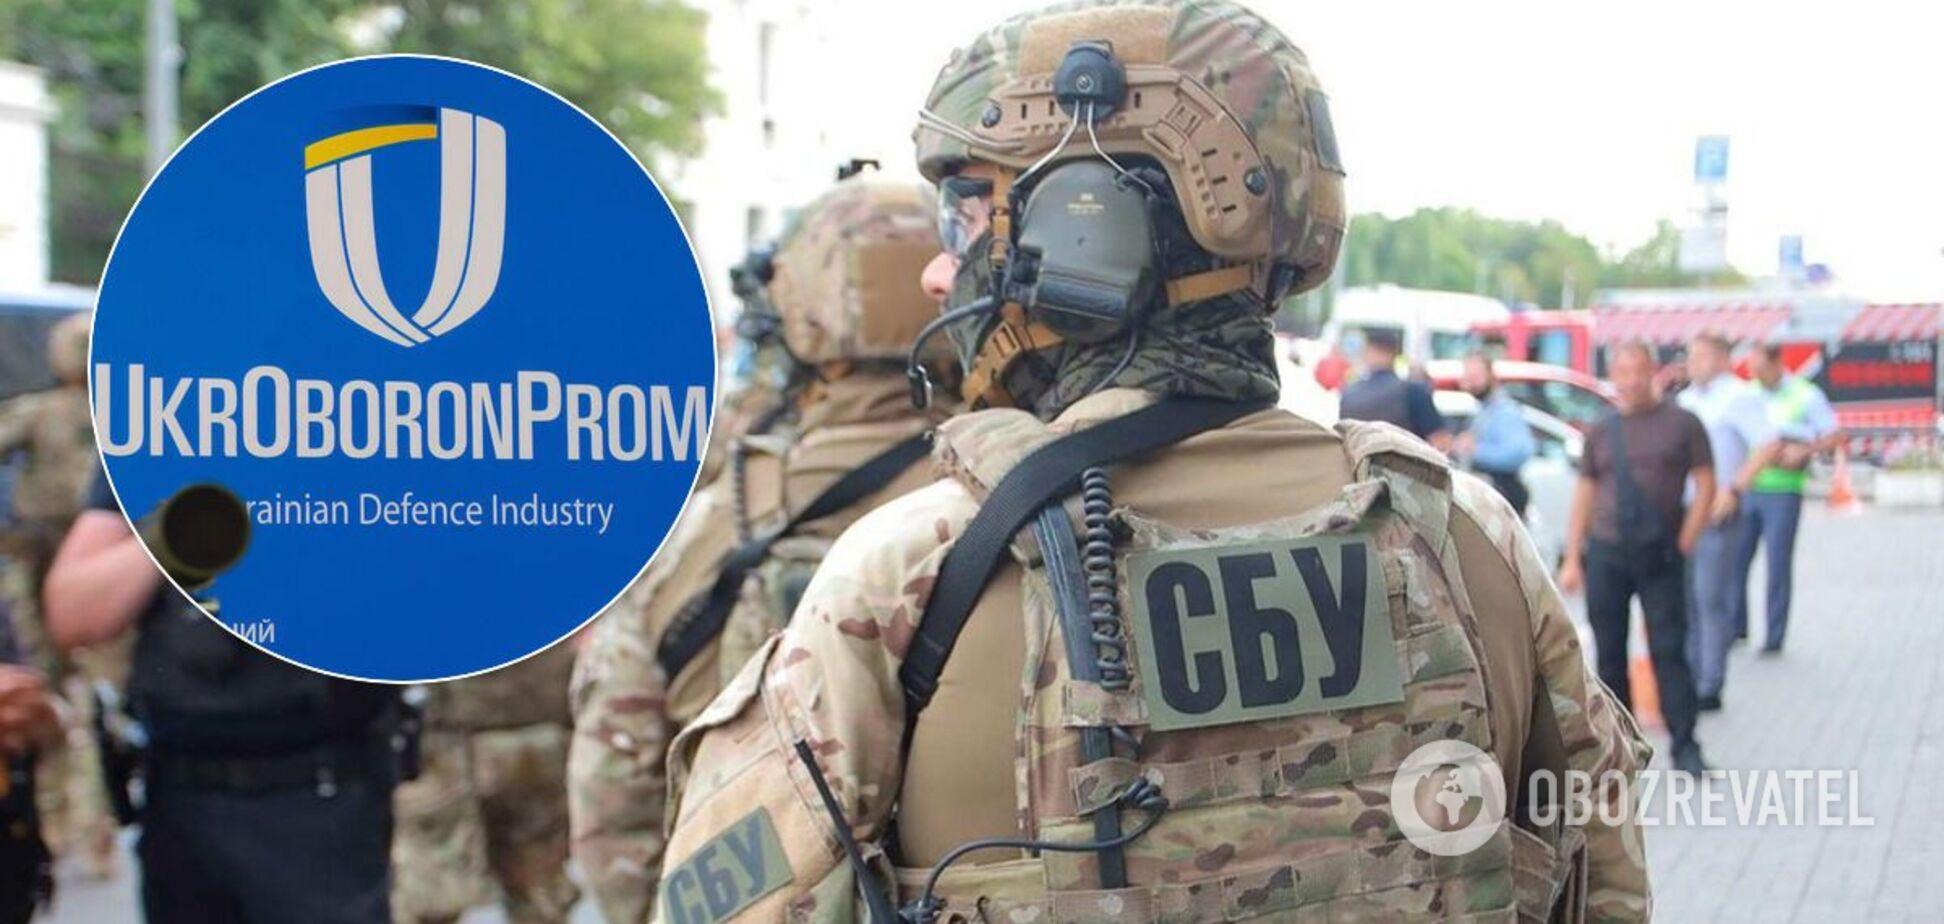 СБУ прийшла в 'Укроборонпром' з обшуками